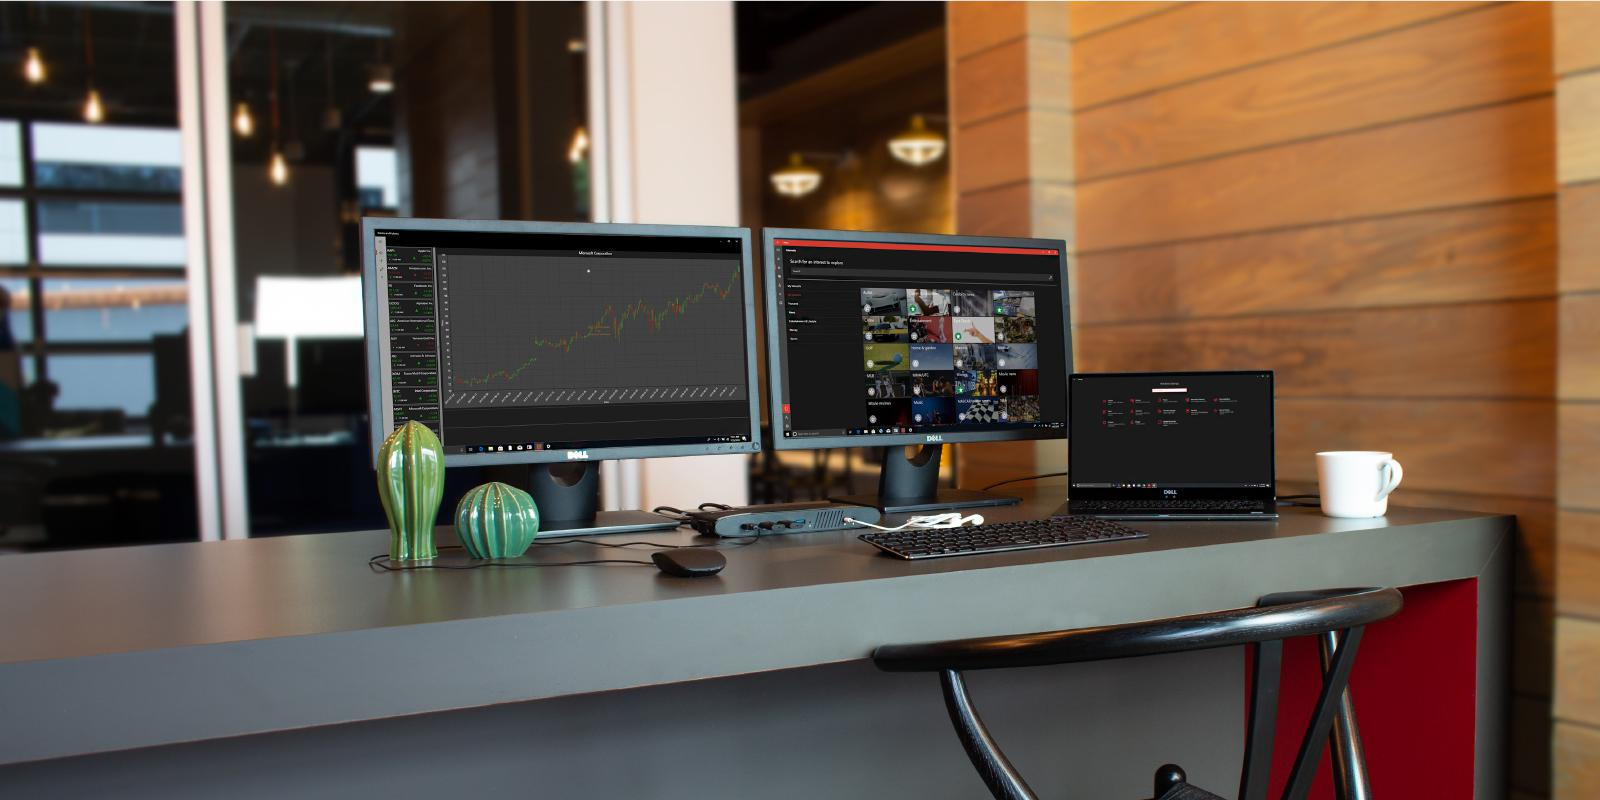 Display setup using two 4K HDMI monitors and a Plugable UD-6950H